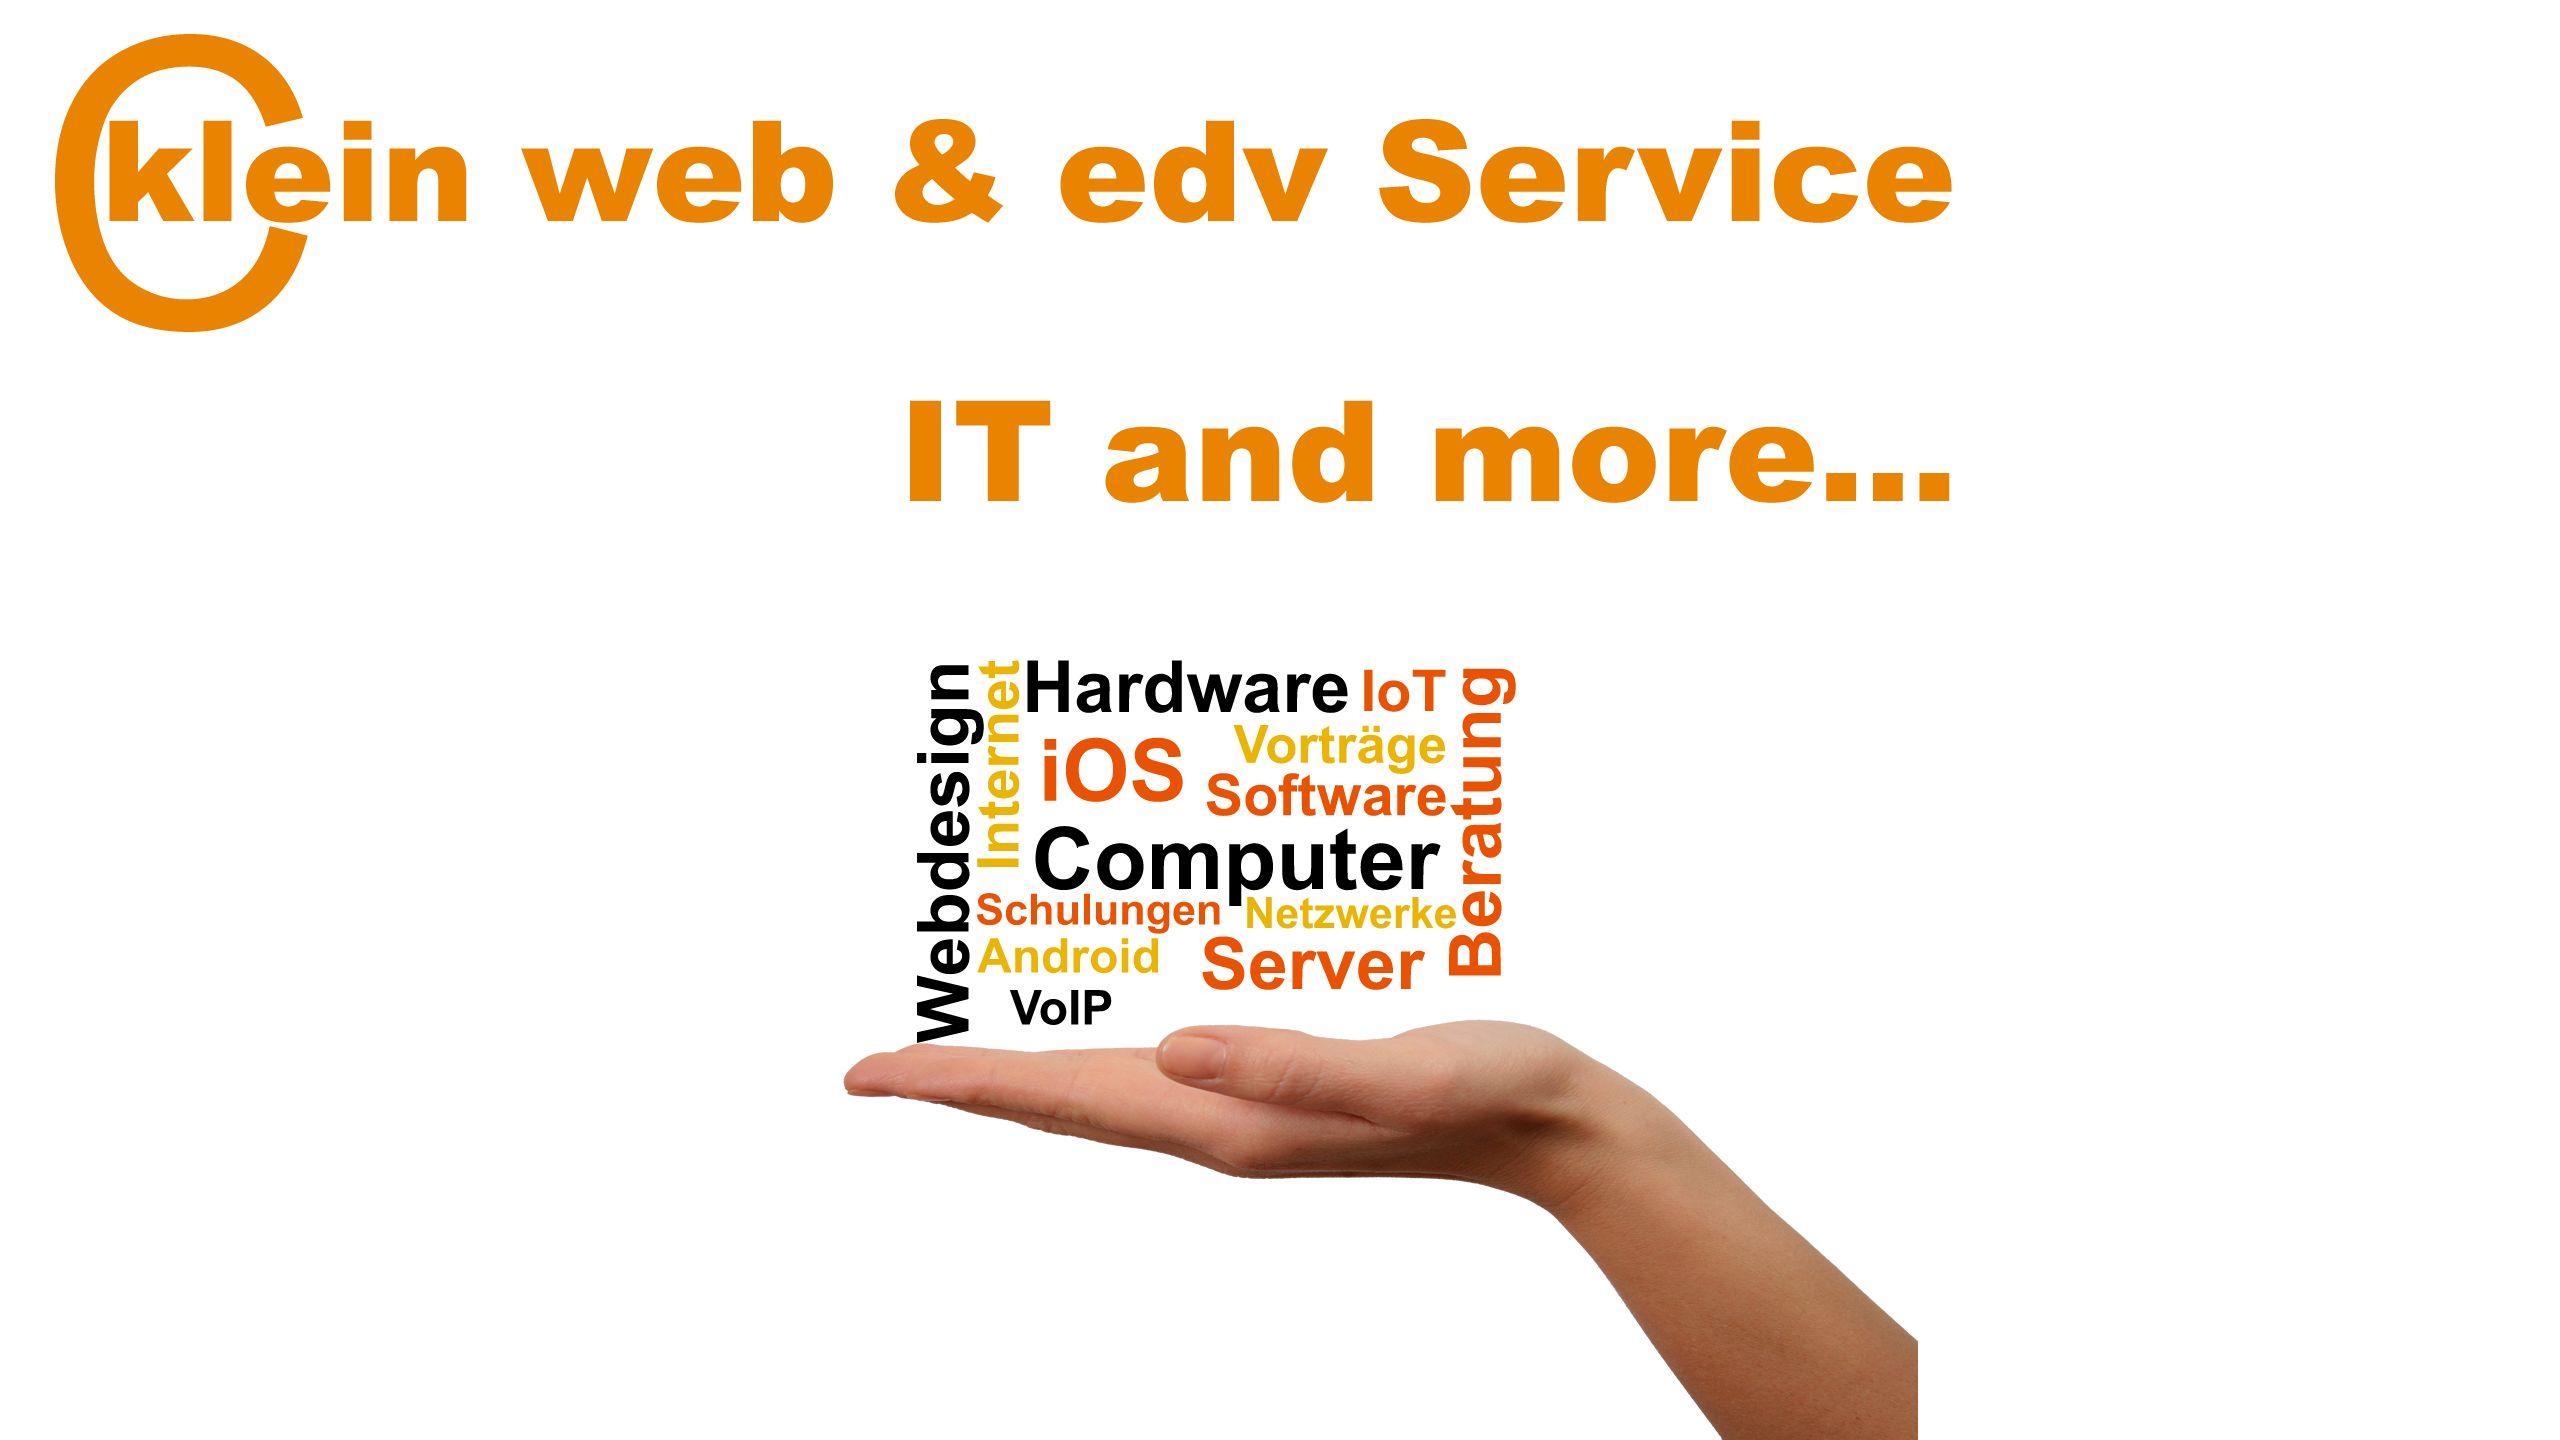 Cklein web & edv Service